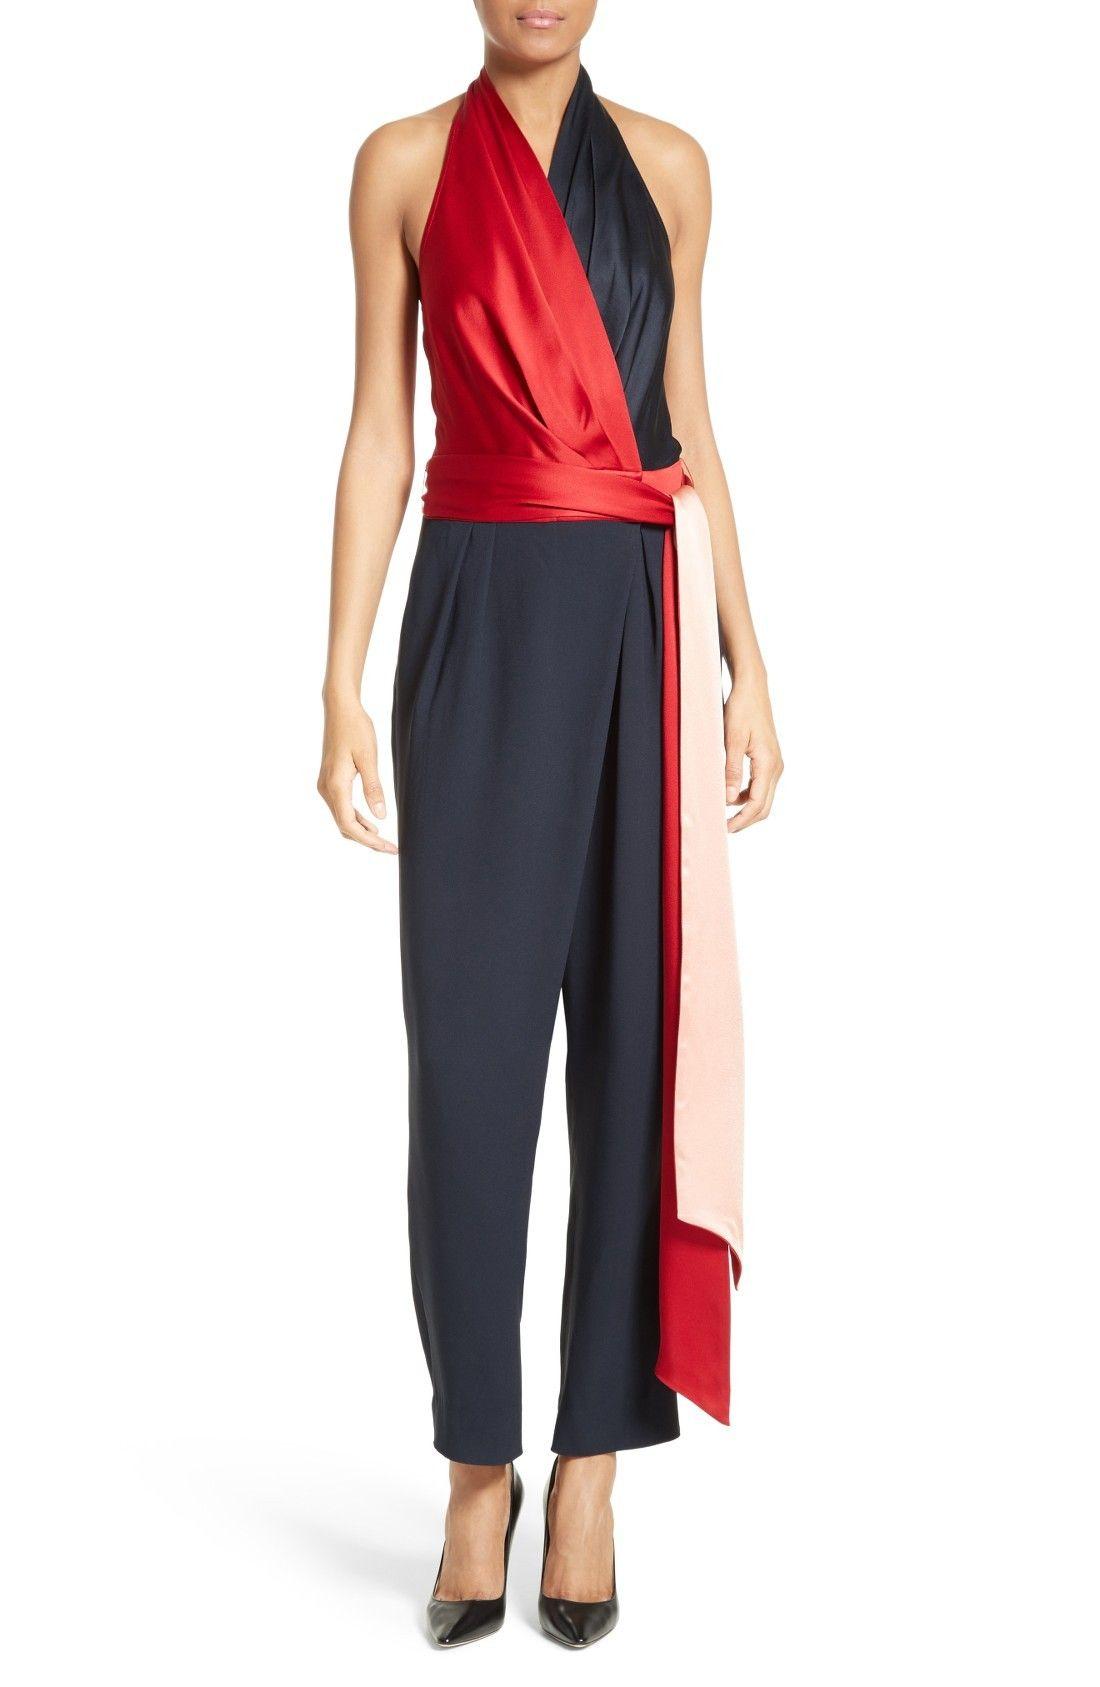 57ab6d742736 New DIANE VON FURSTENBERG Colorblock Wrap Halter Jumpsuit fashion online.    598   shop hoodress